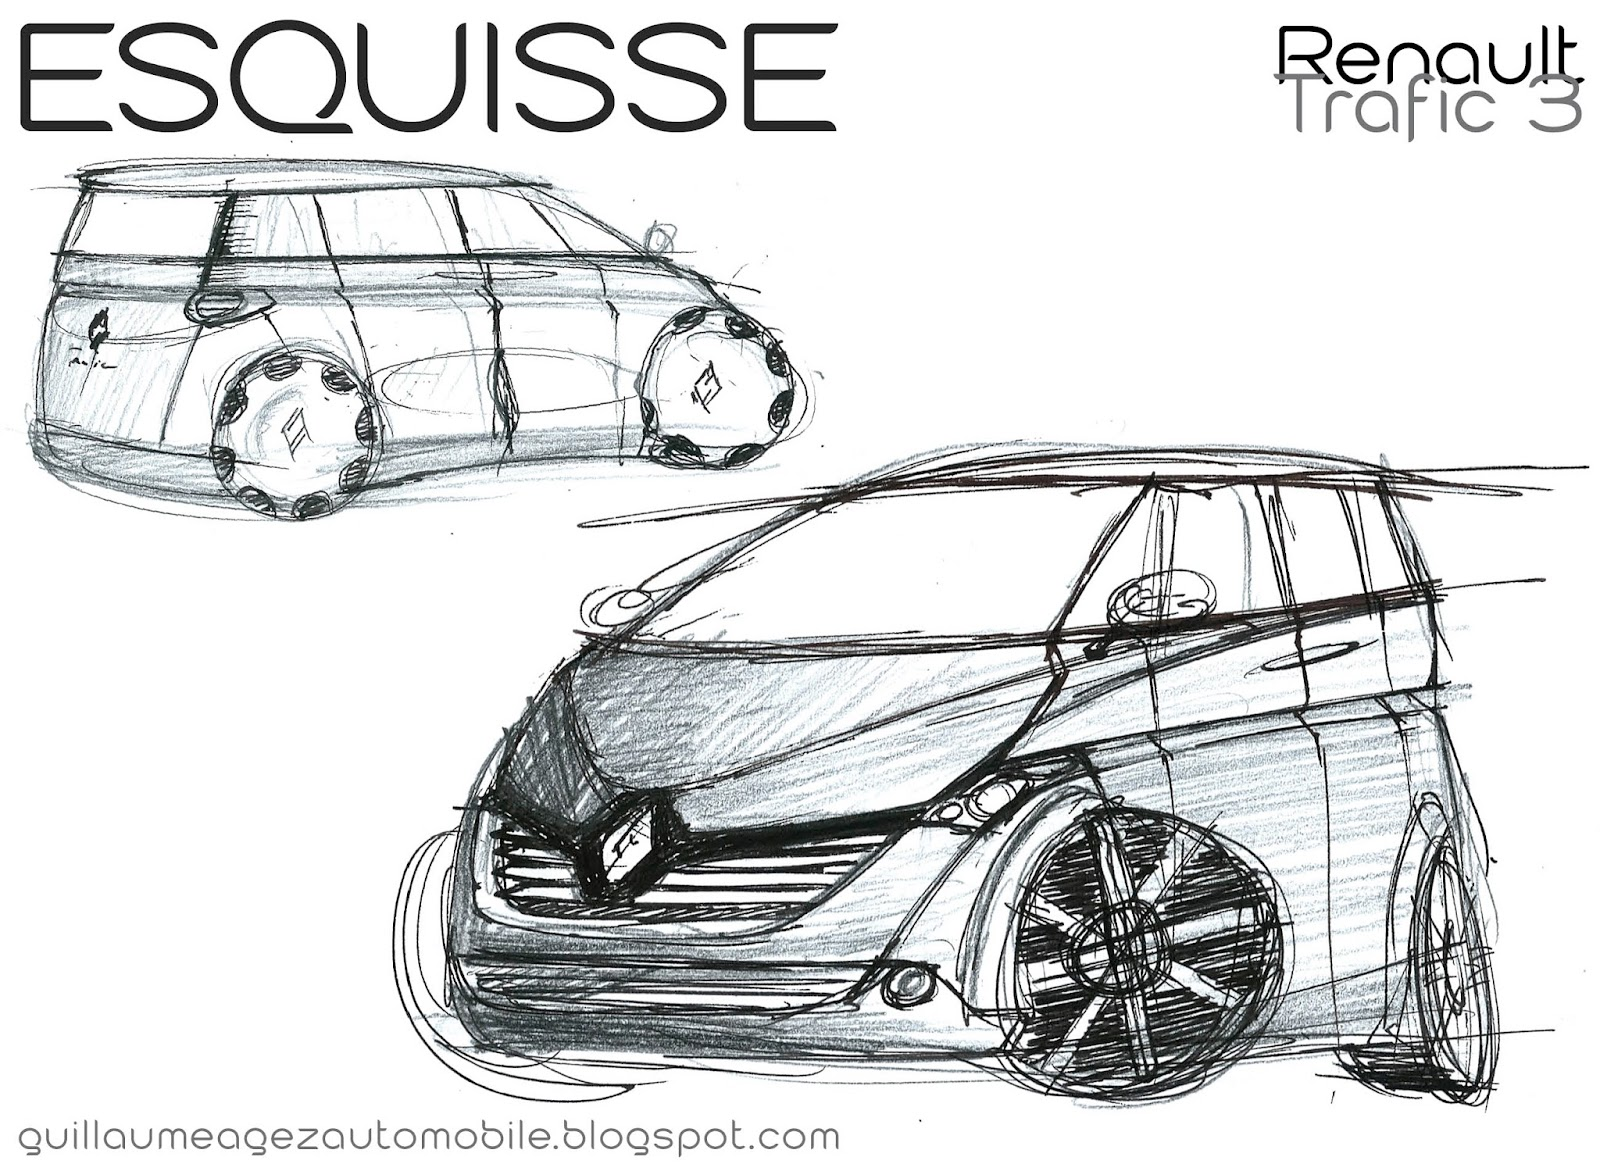 guillaume agez automobile esquisse renault trafic 3. Black Bedroom Furniture Sets. Home Design Ideas